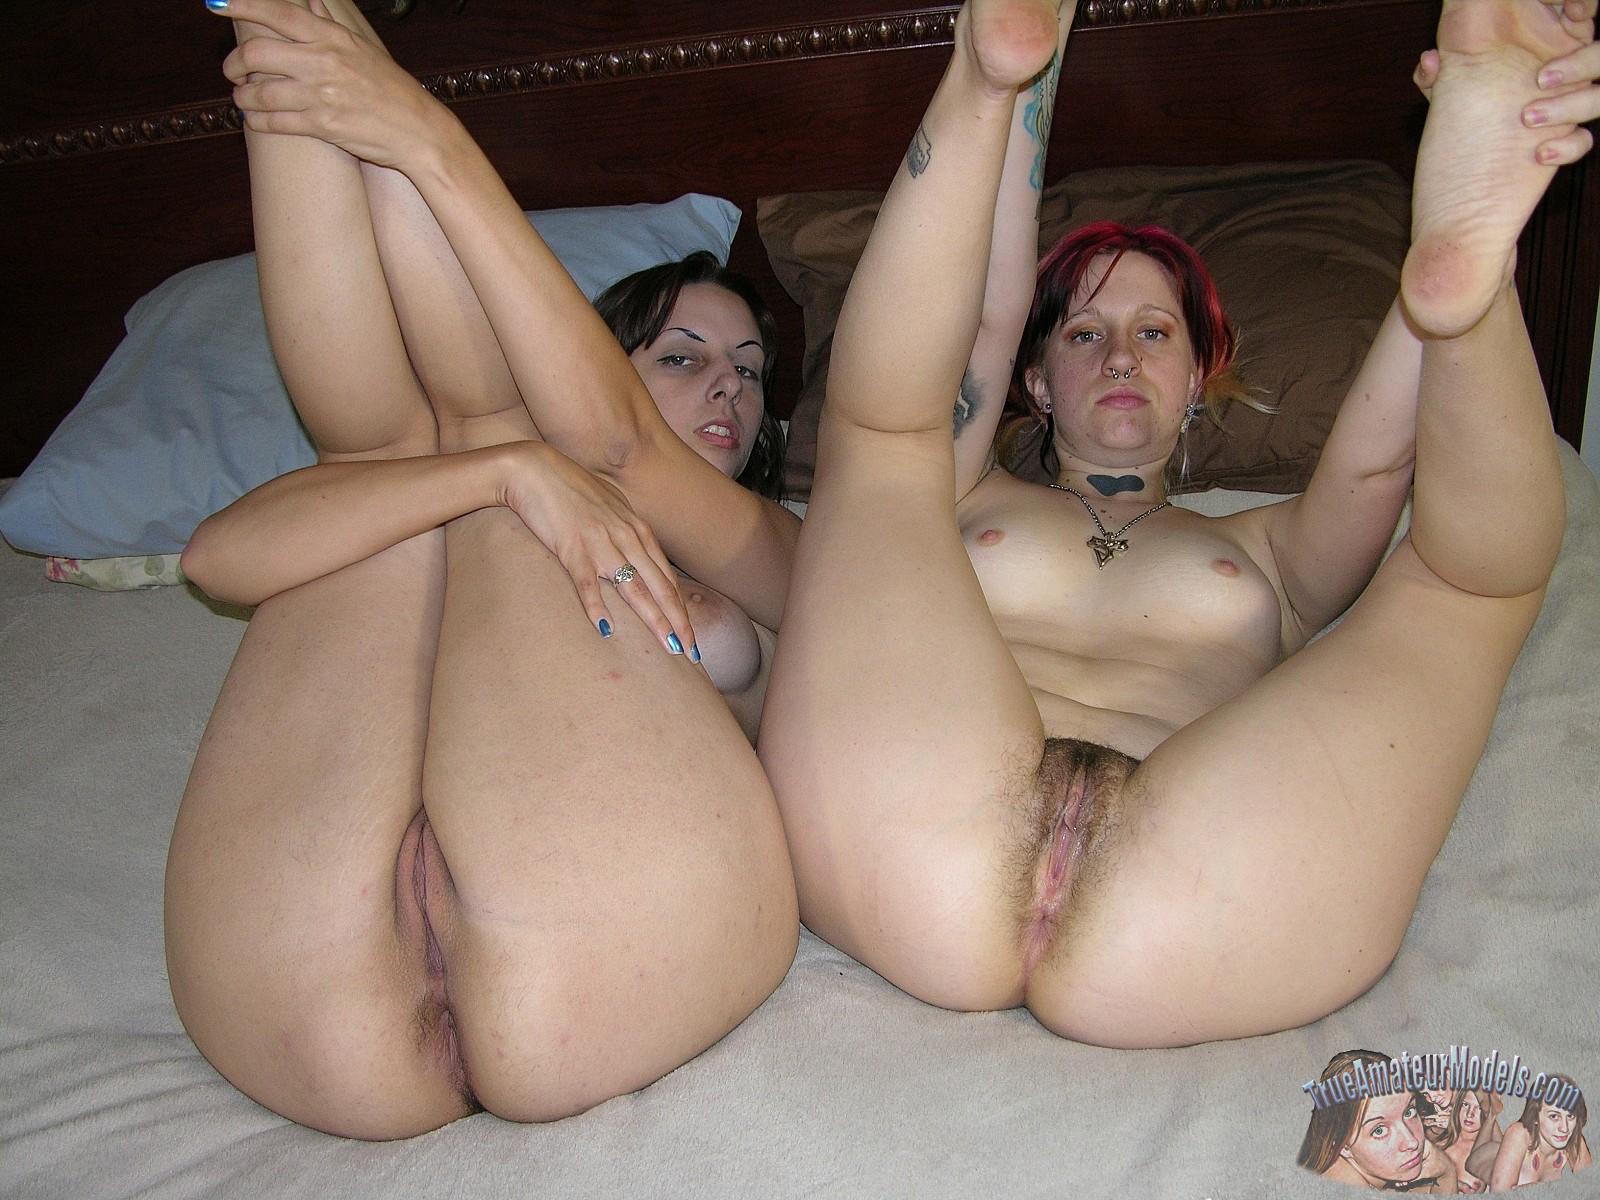 Amatur Nude Girls